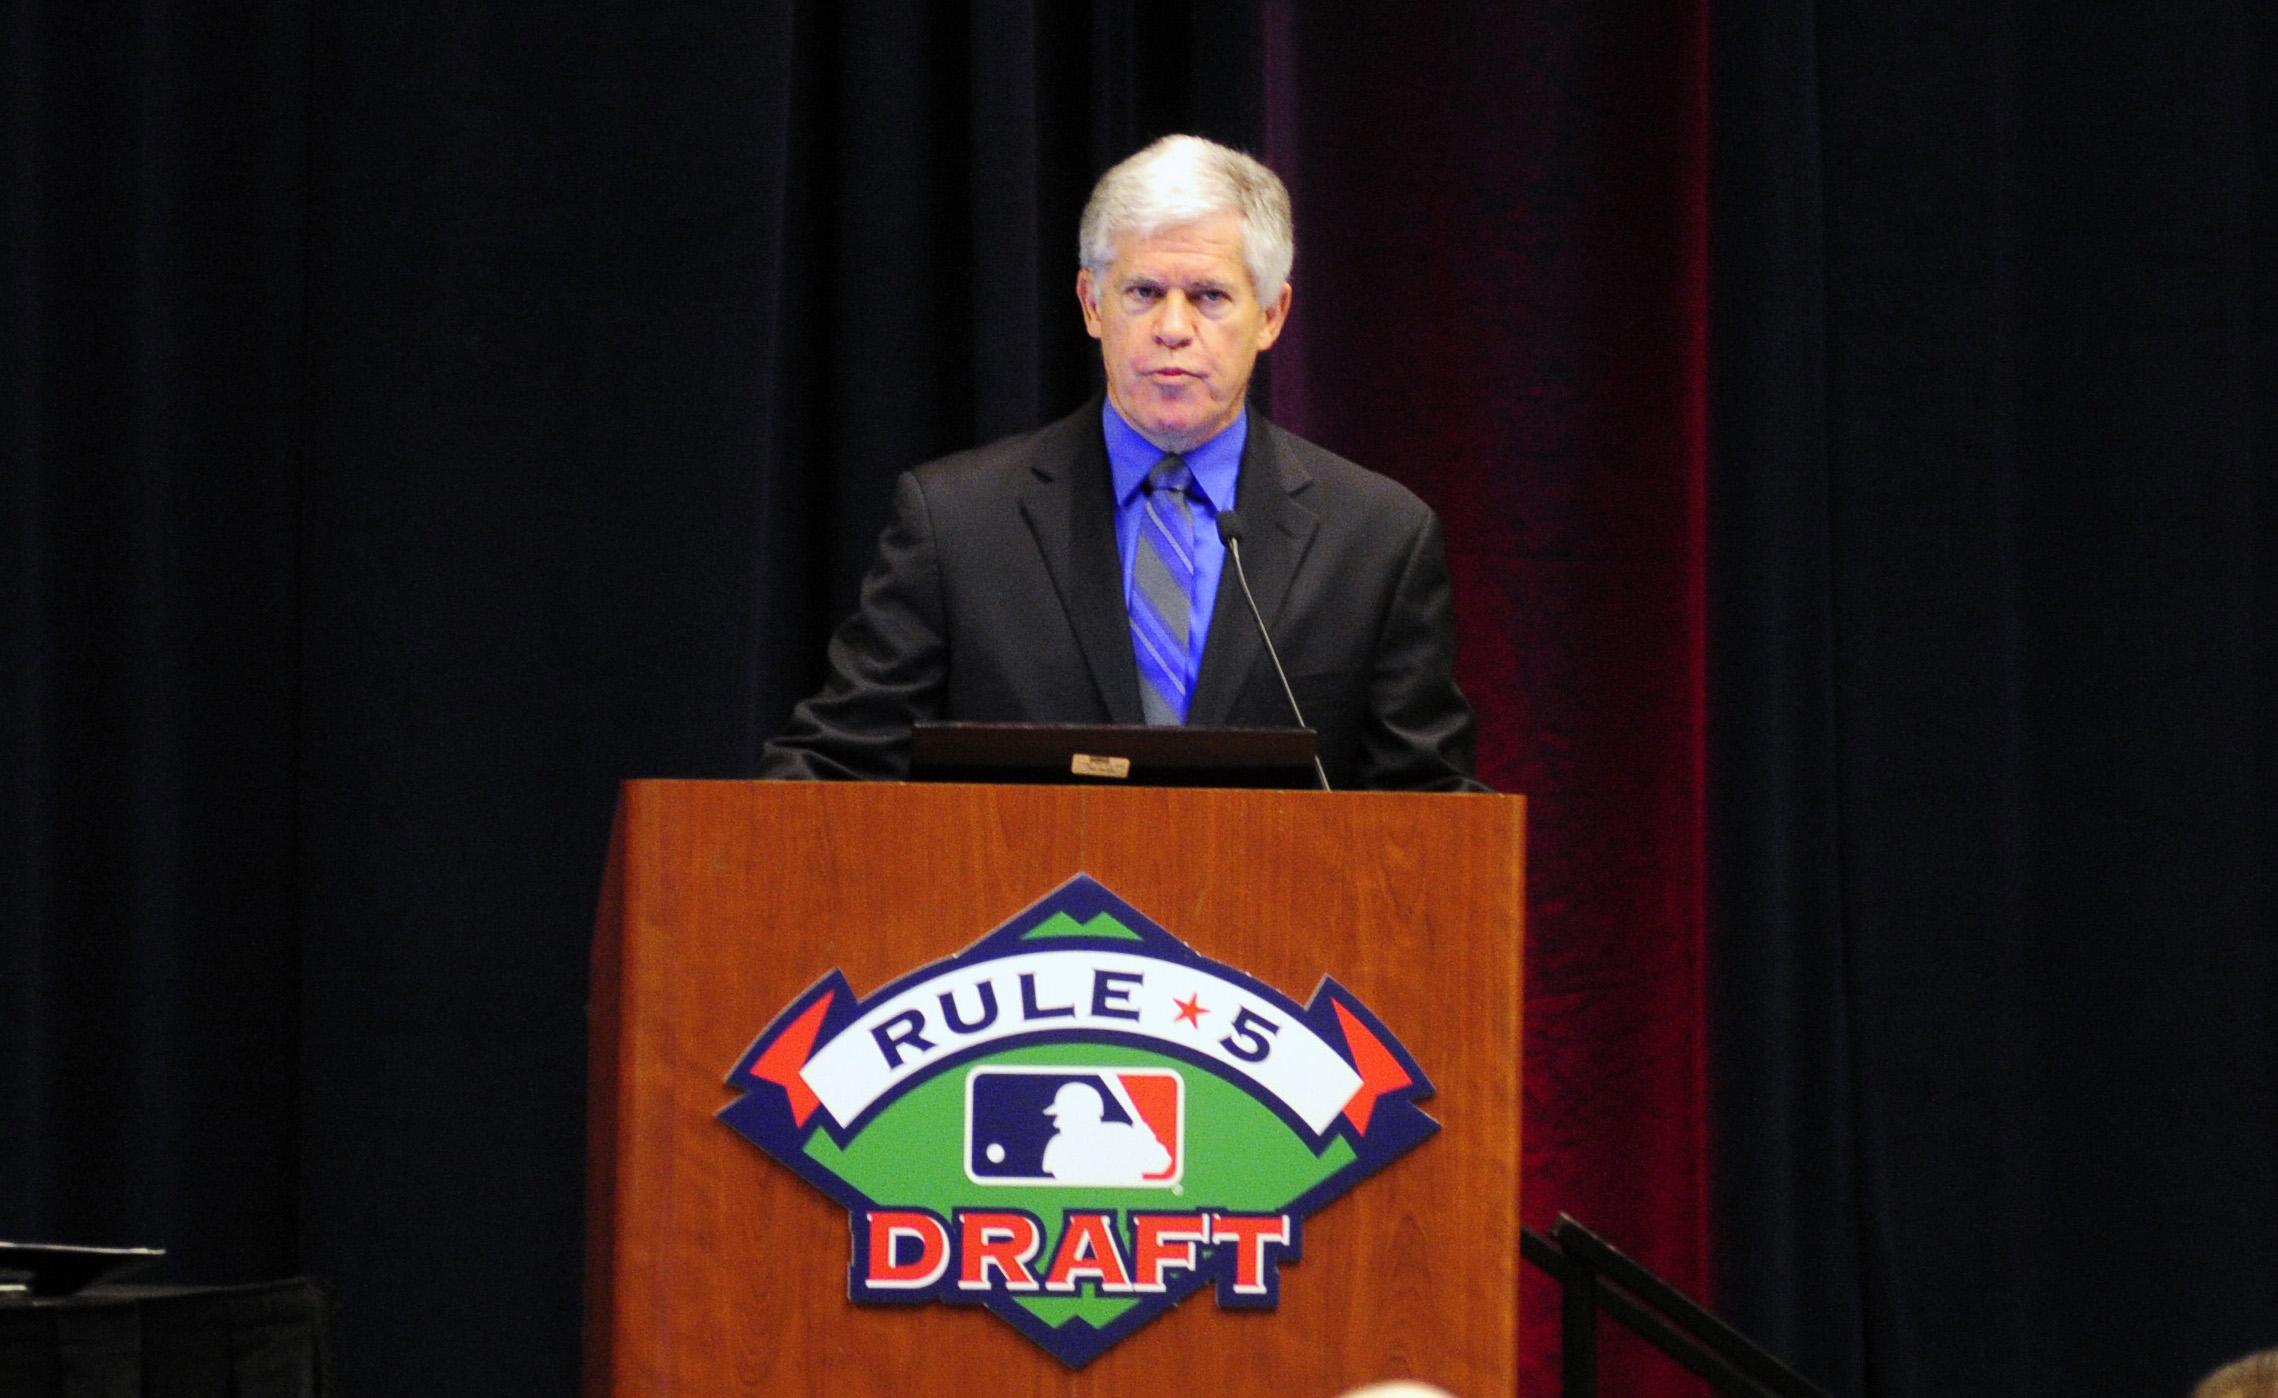 In the Rule 5 draft, teams zzzzzzzzzzzzz